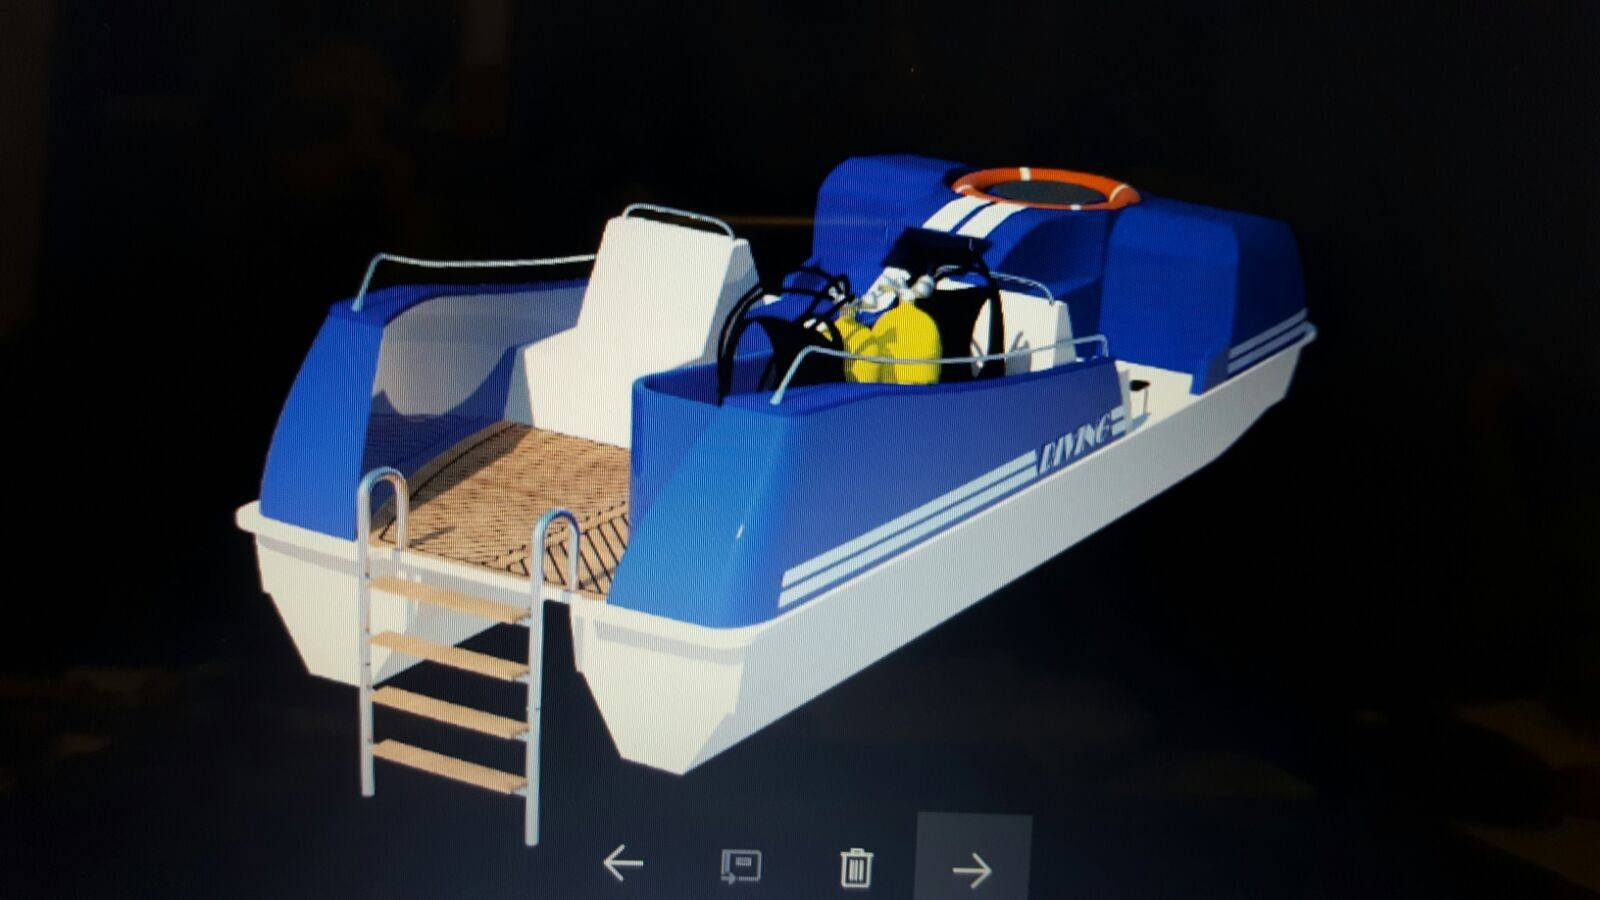 pedalò-subacquei1